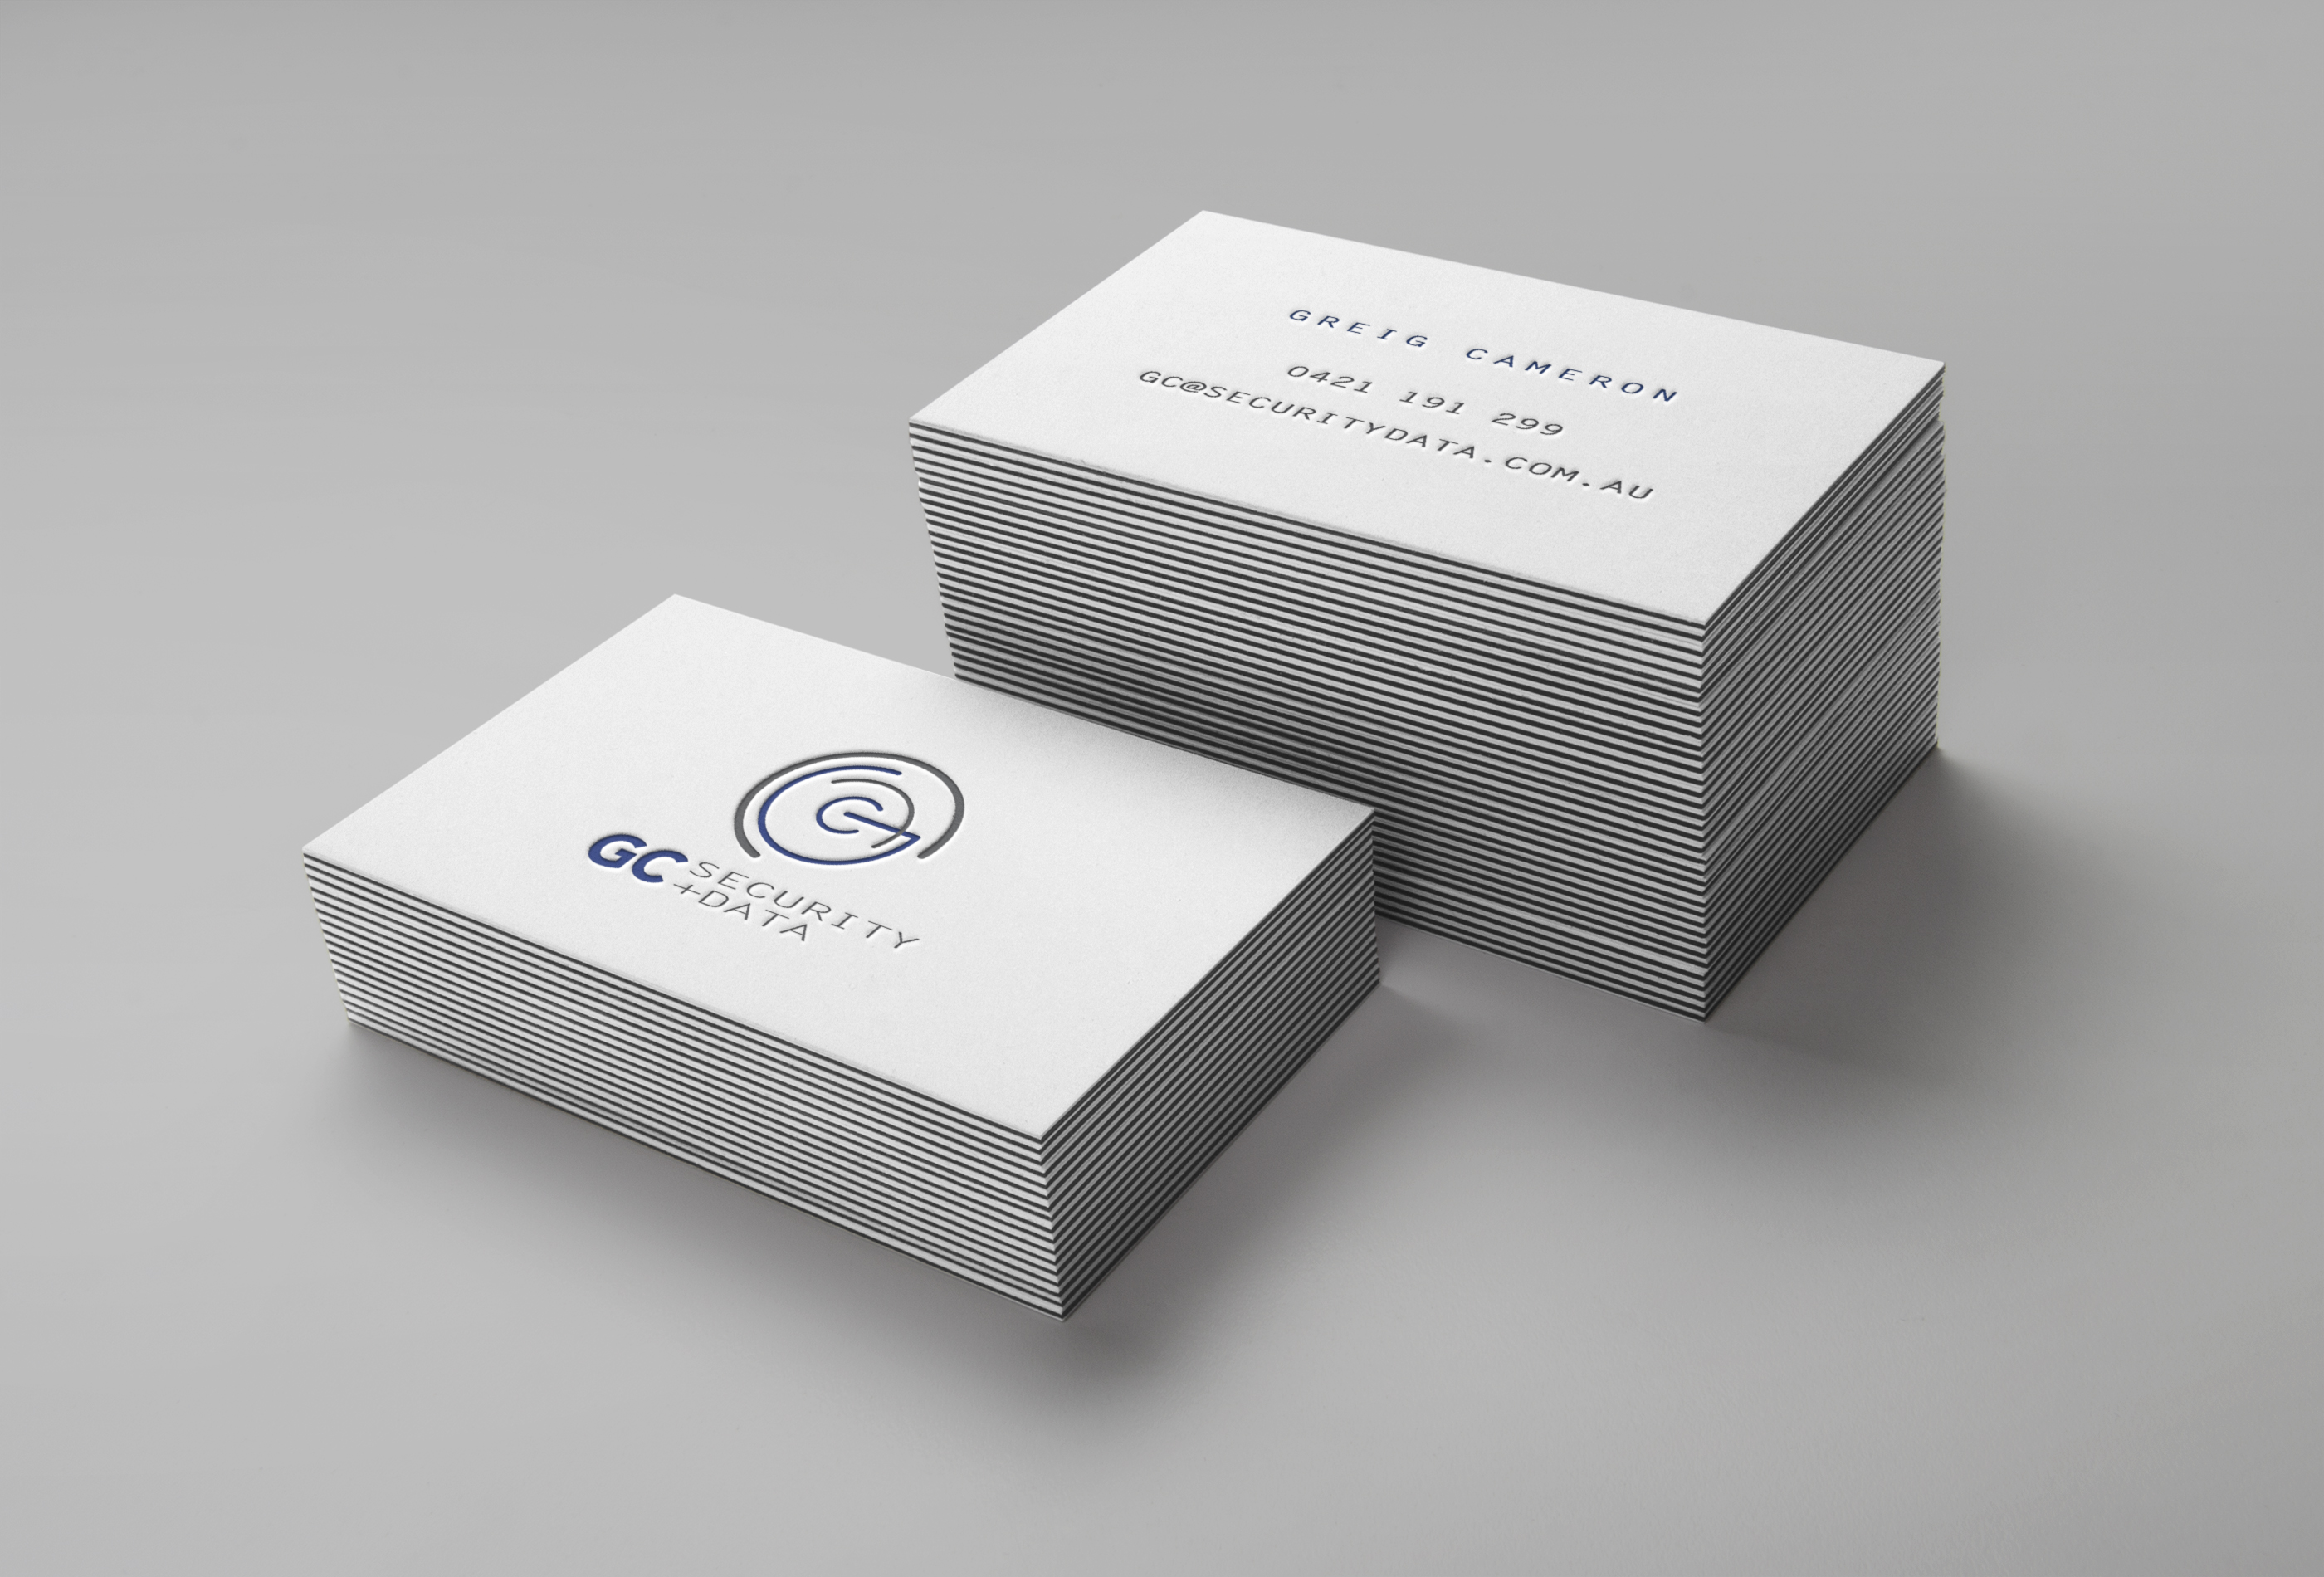 GC Security & Data | Business Cards